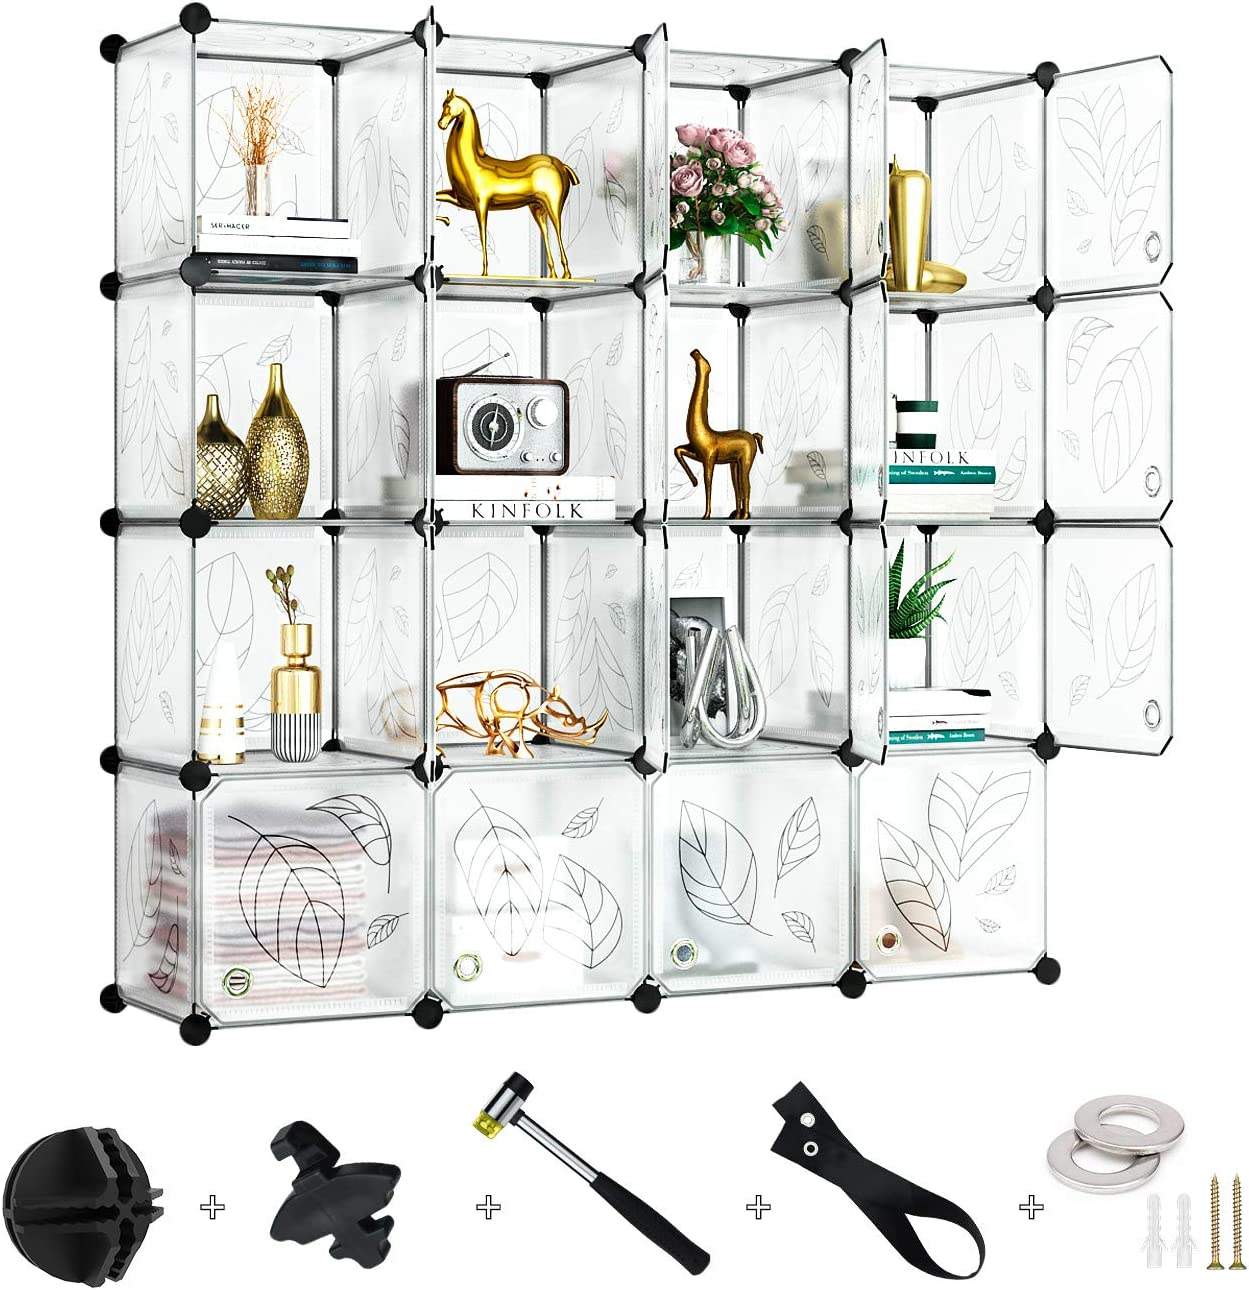 GREENSTELL Cube Storage Brand Trust new Organizer Closet Plastic with